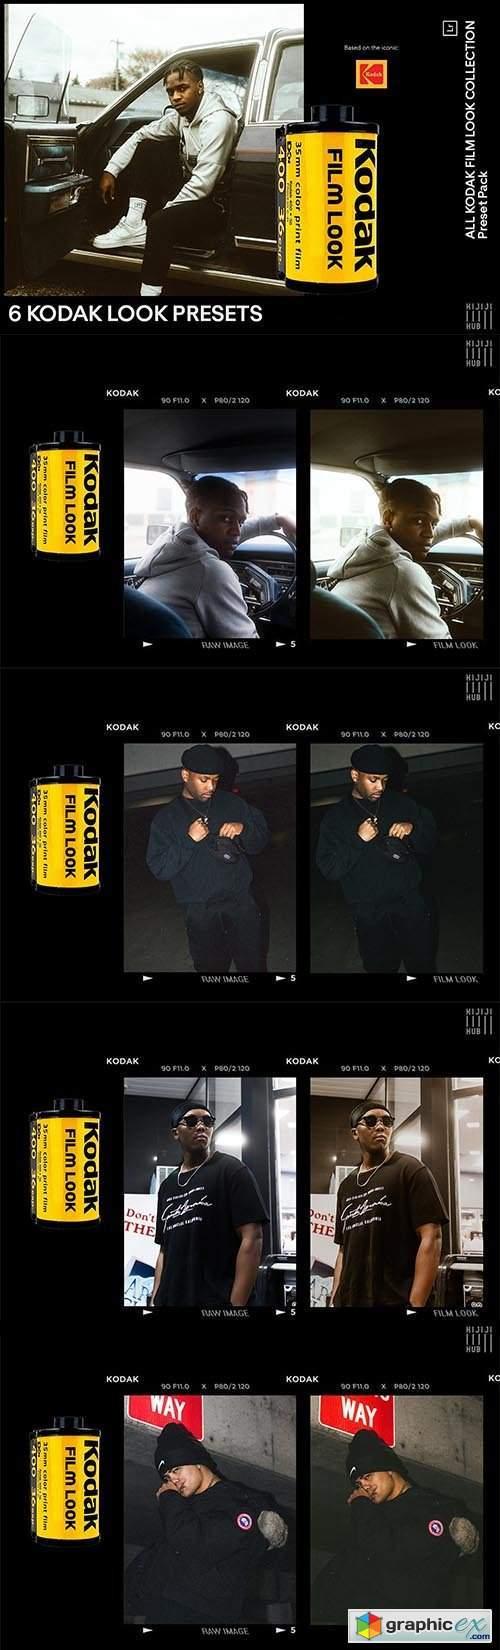 6 Kodak Looks Presets